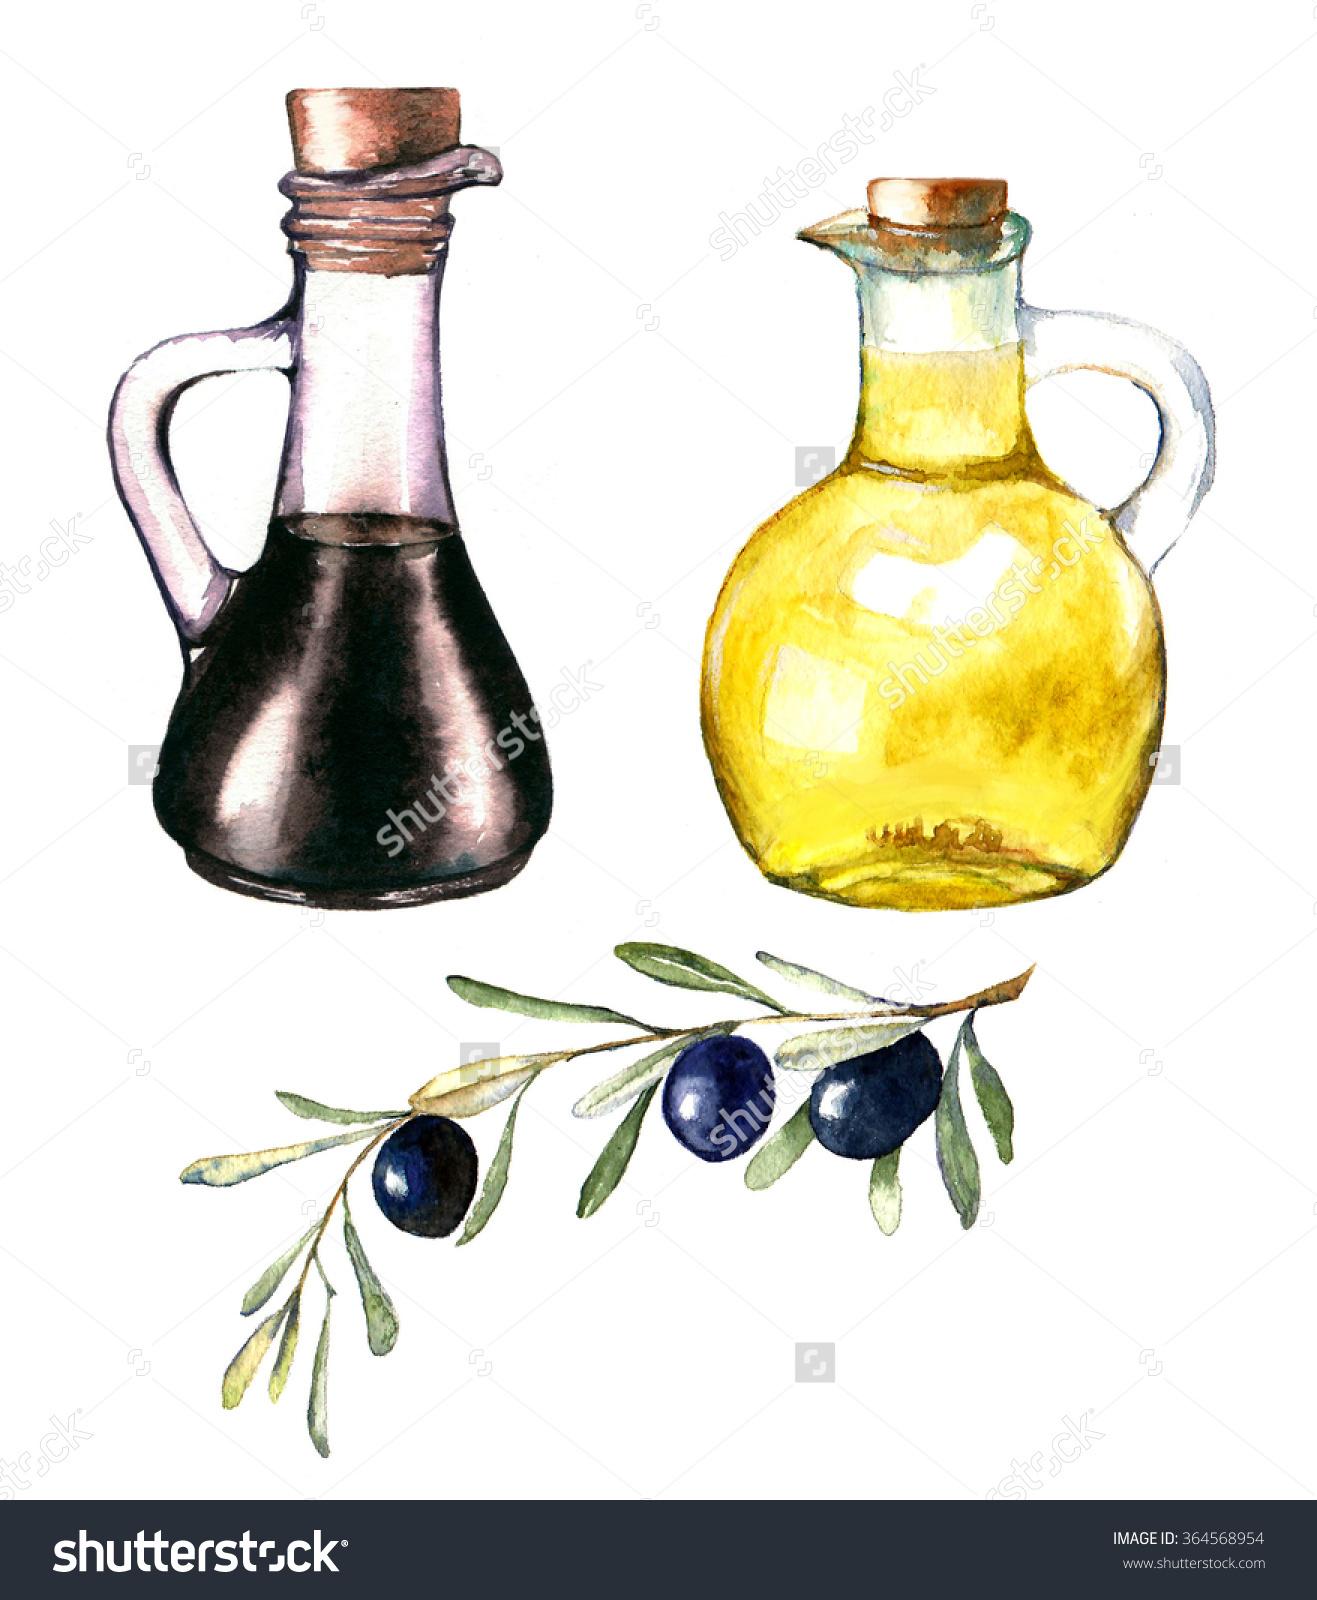 Handdrawn Watercolor Illustration Olive Oil Balsamic Stock.